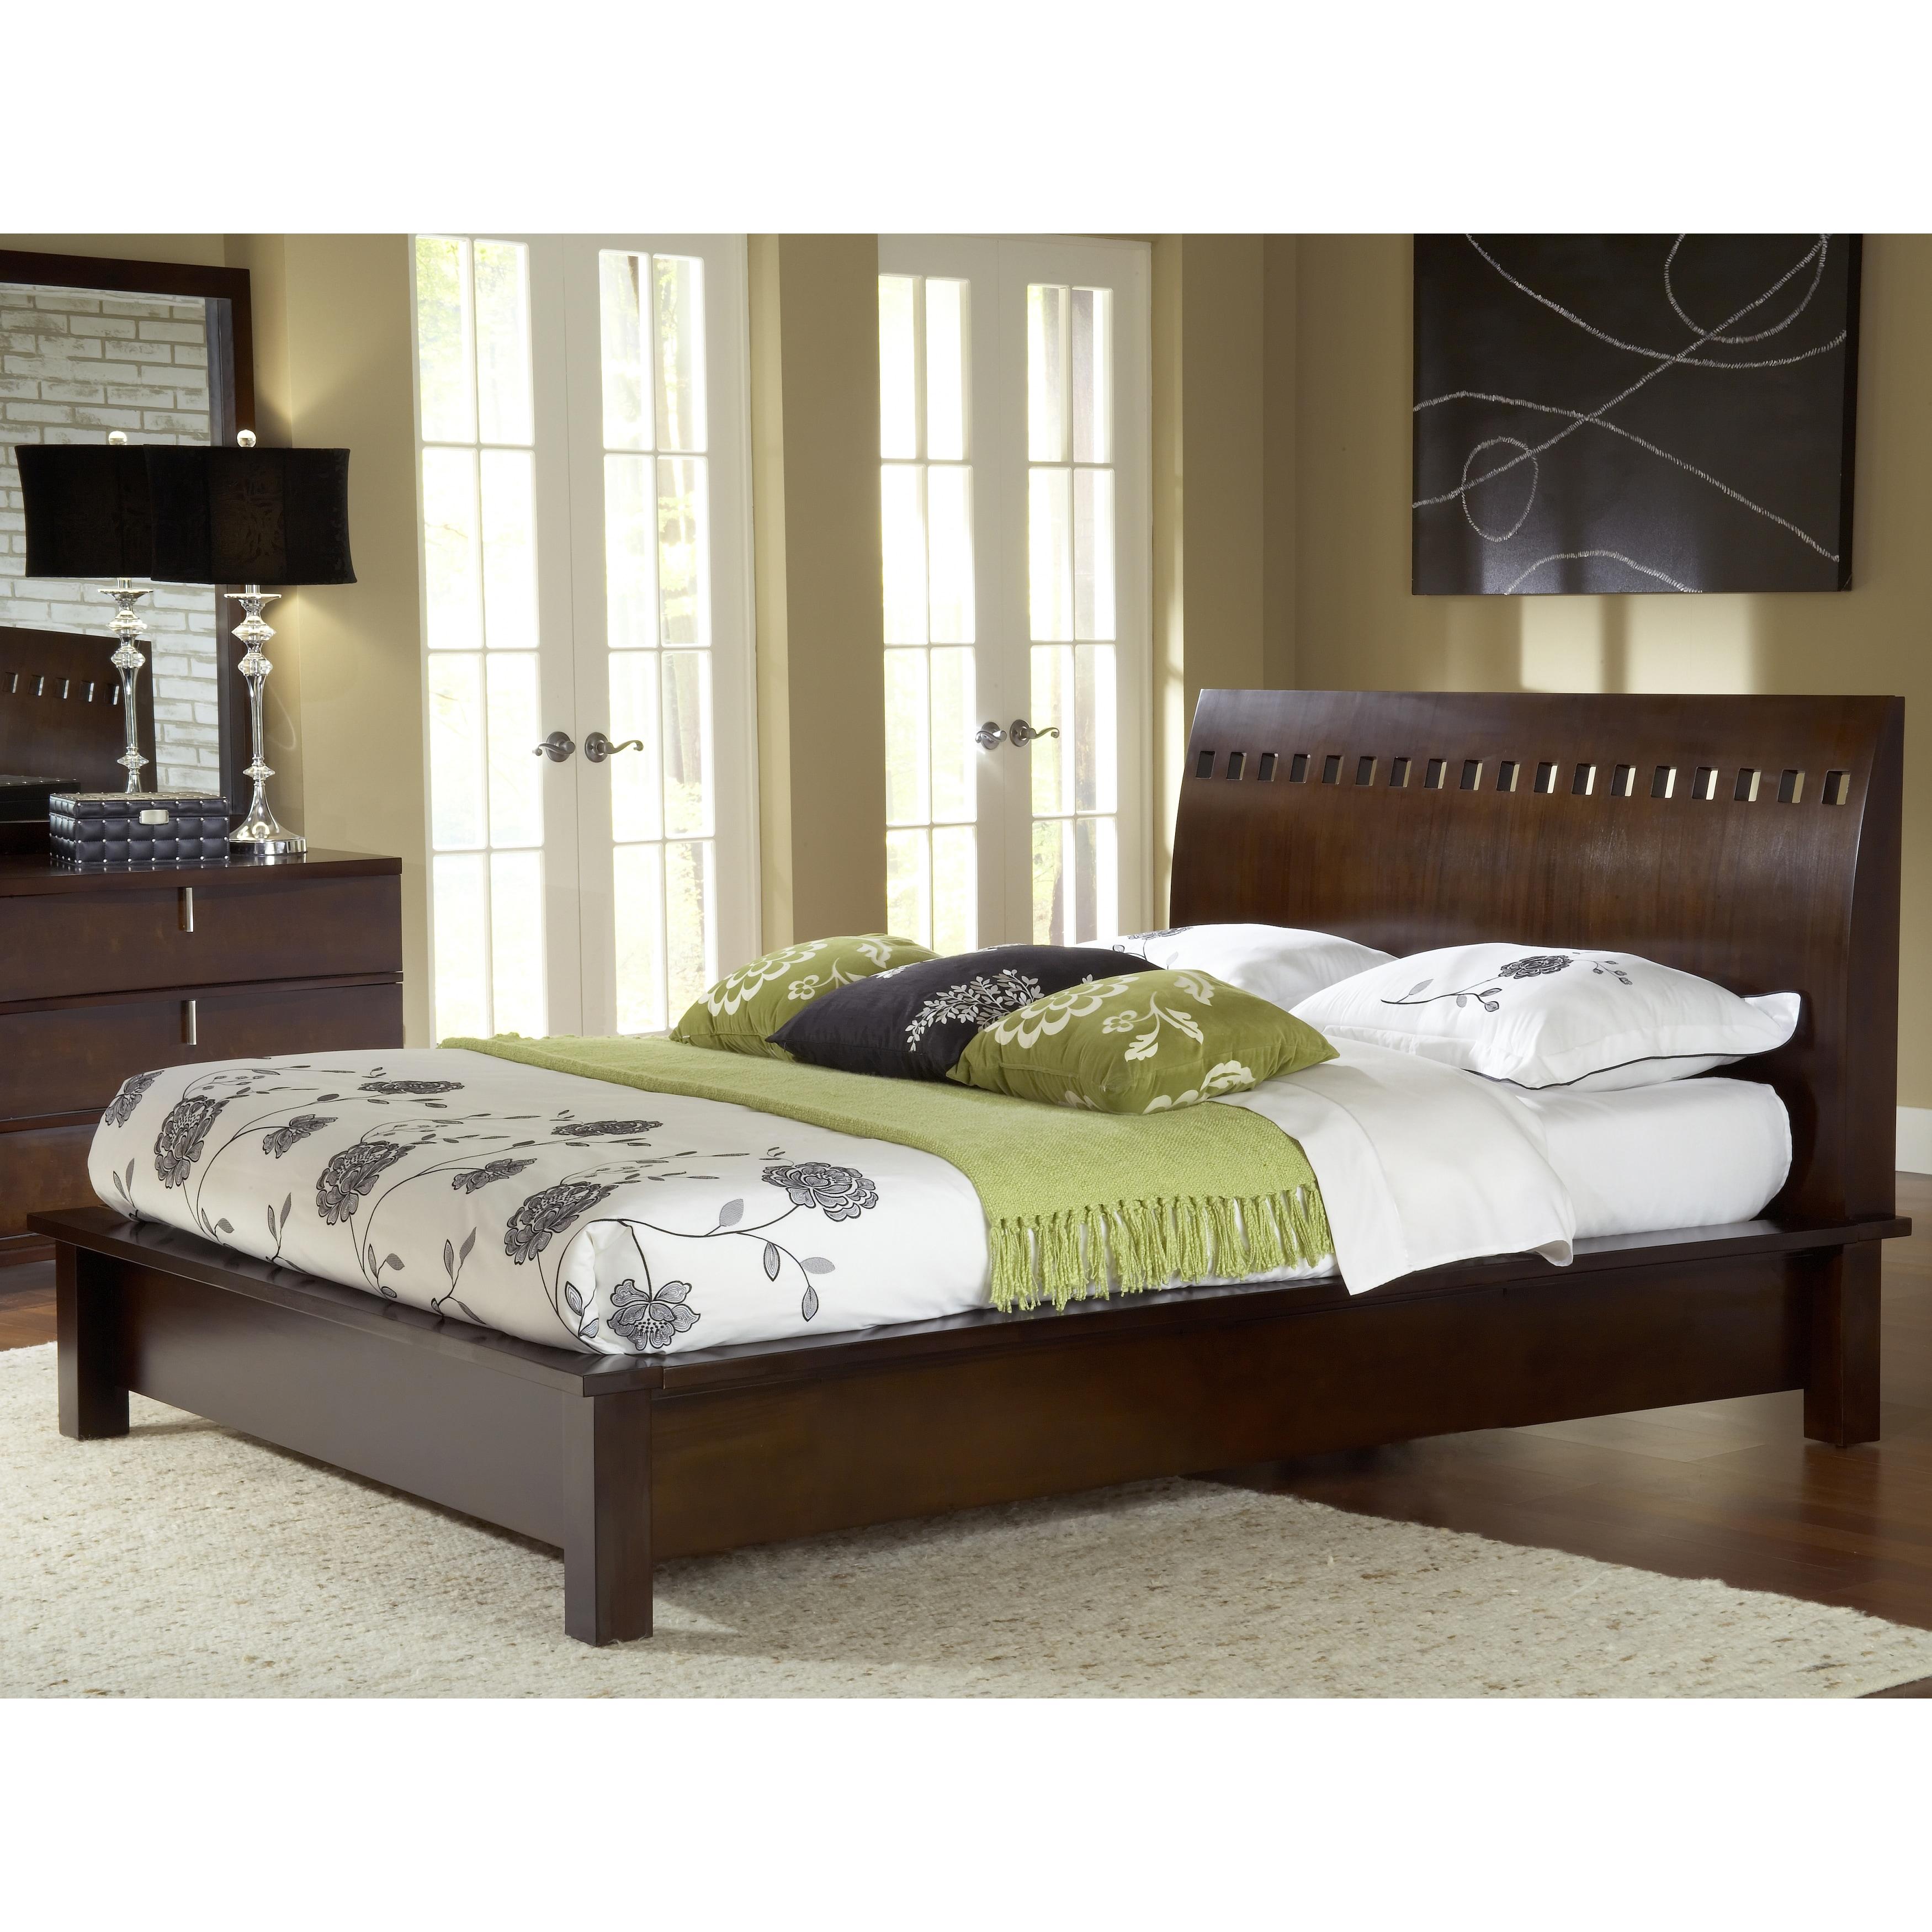 Domusindo Square Cutout Chocolate Brown Modern Platform Bed